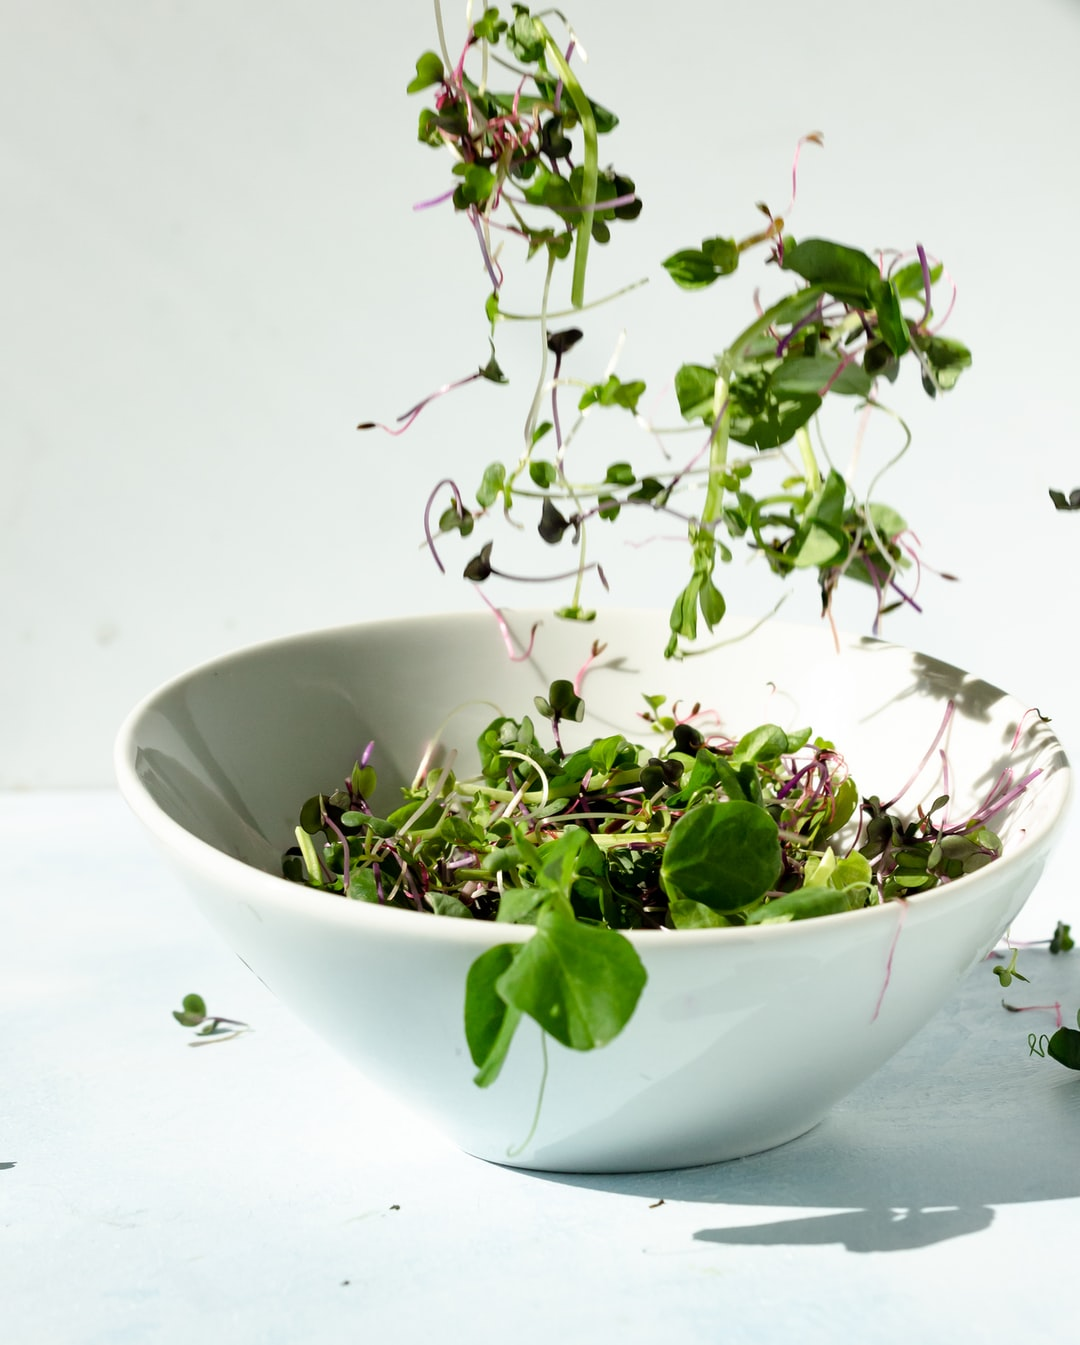 Micro greens falling into a bowl